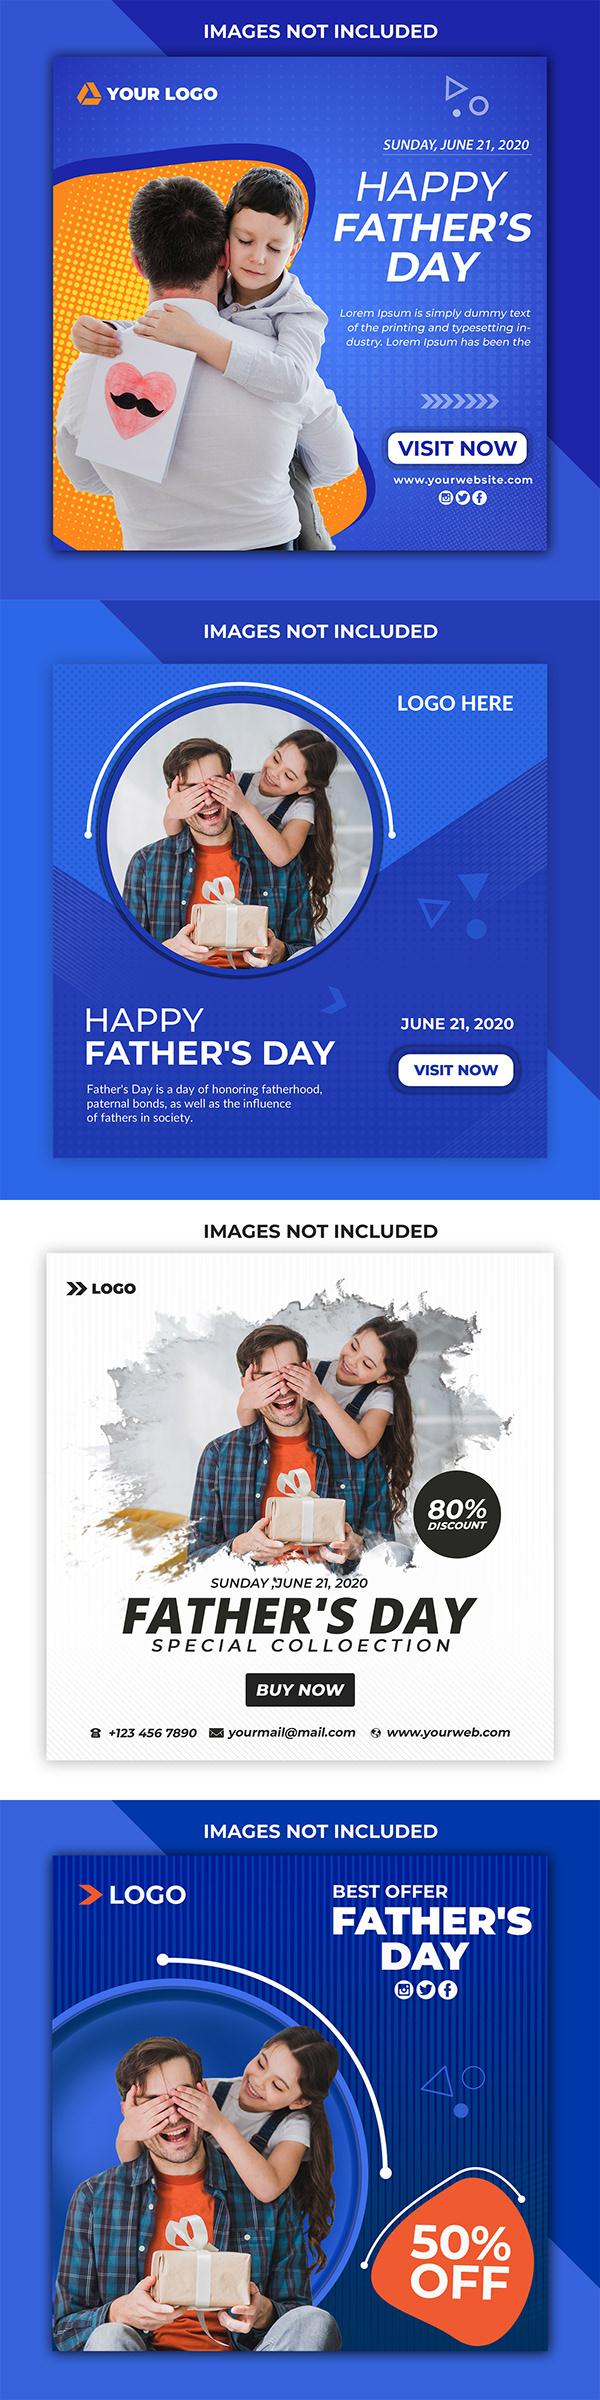 Father's day Social media Design